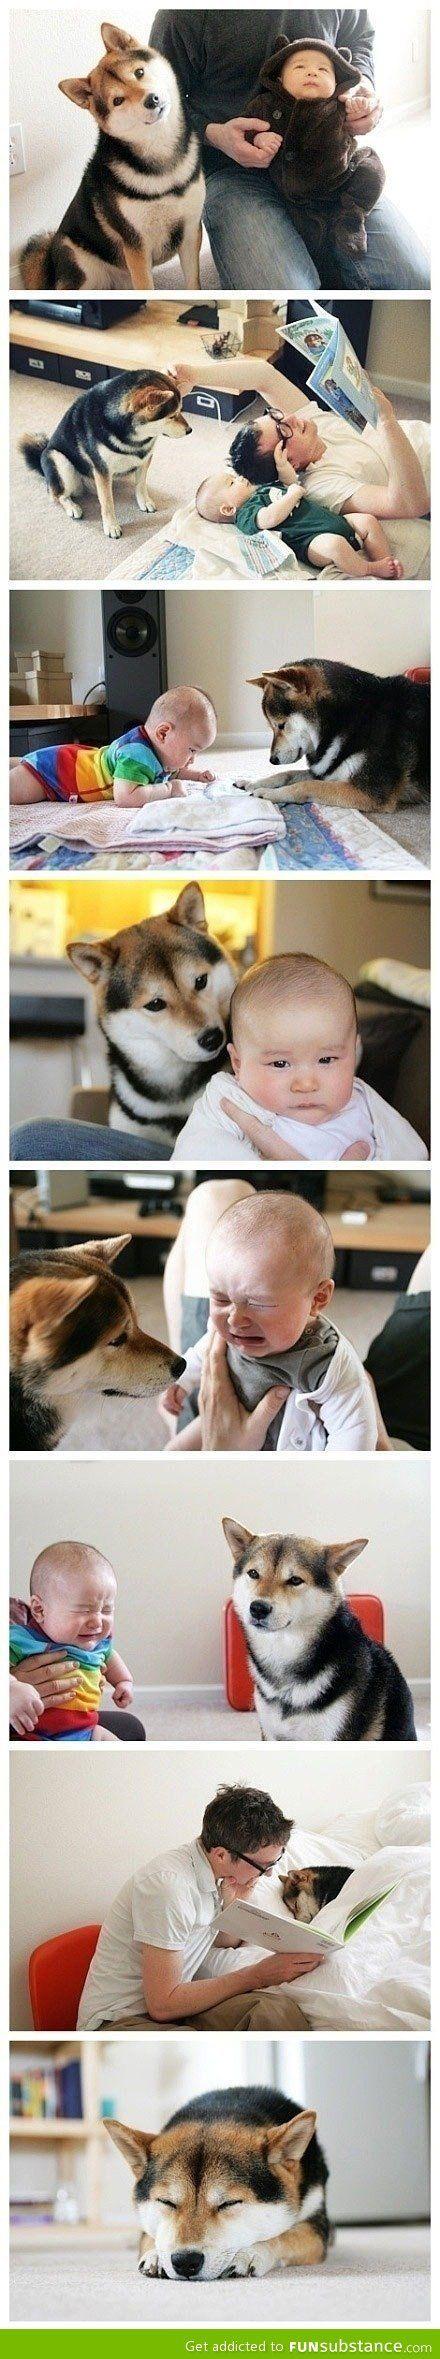 2 baby cuteness